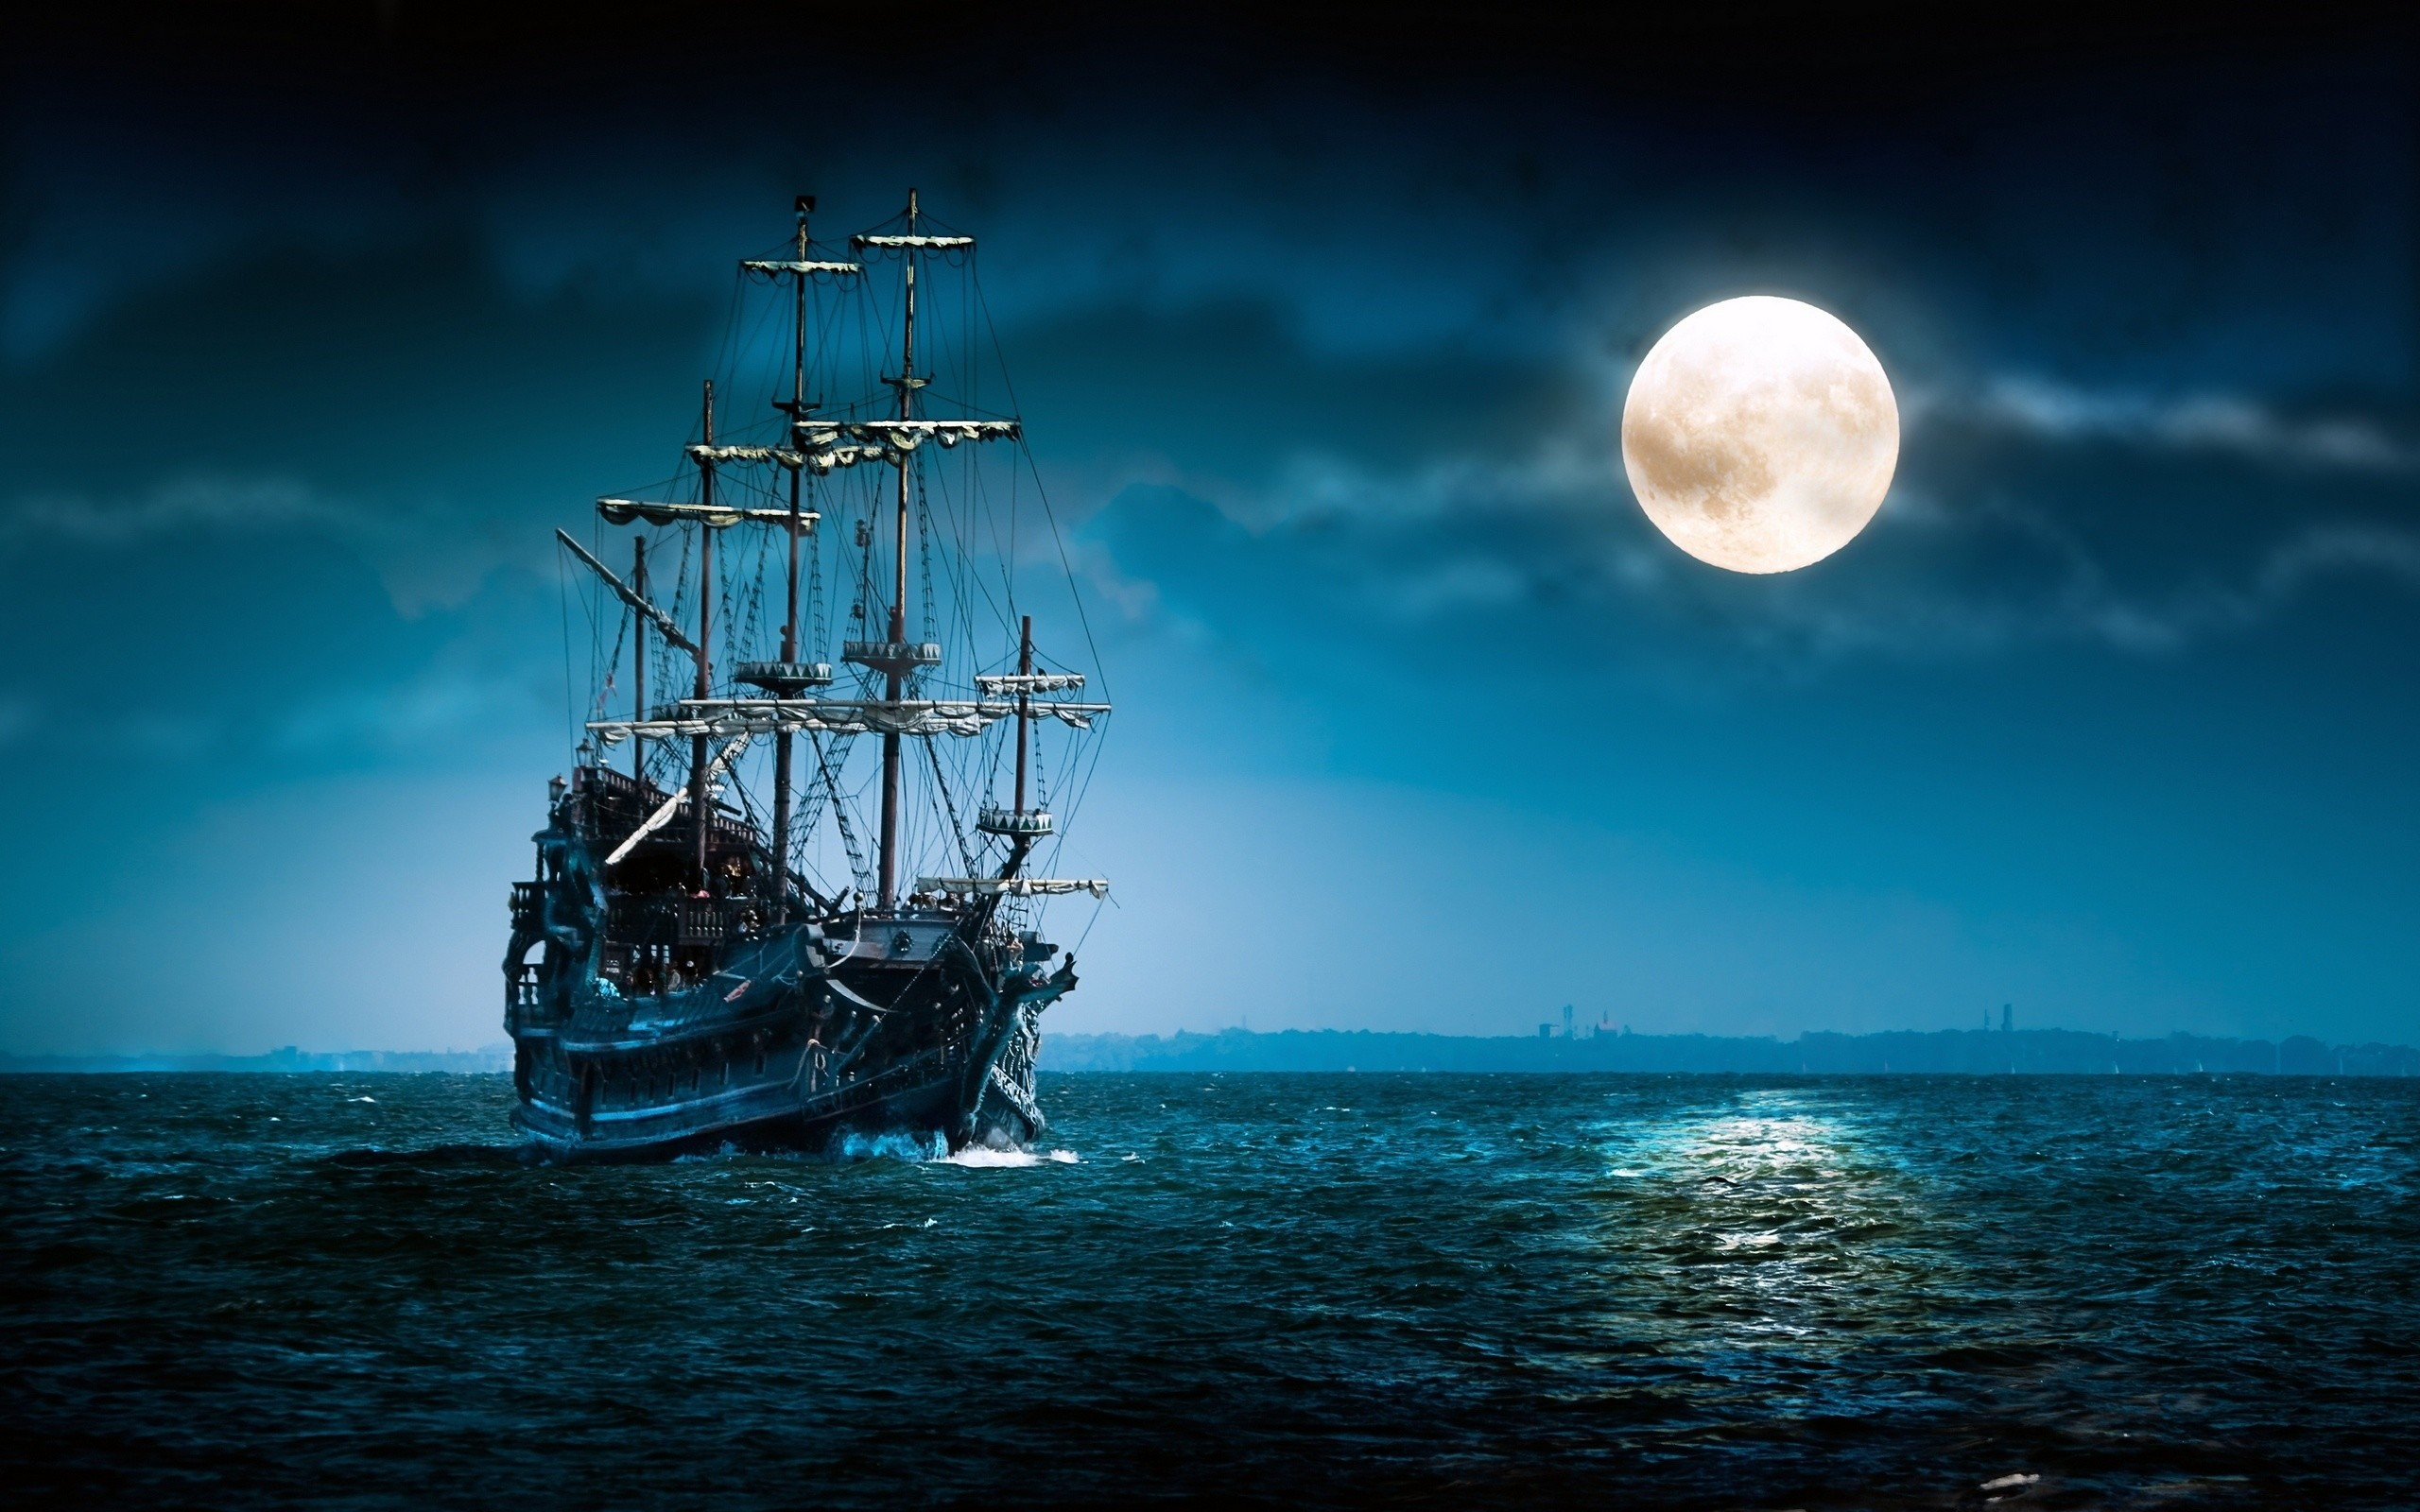 Ghost Pirate Ship Wallpaper